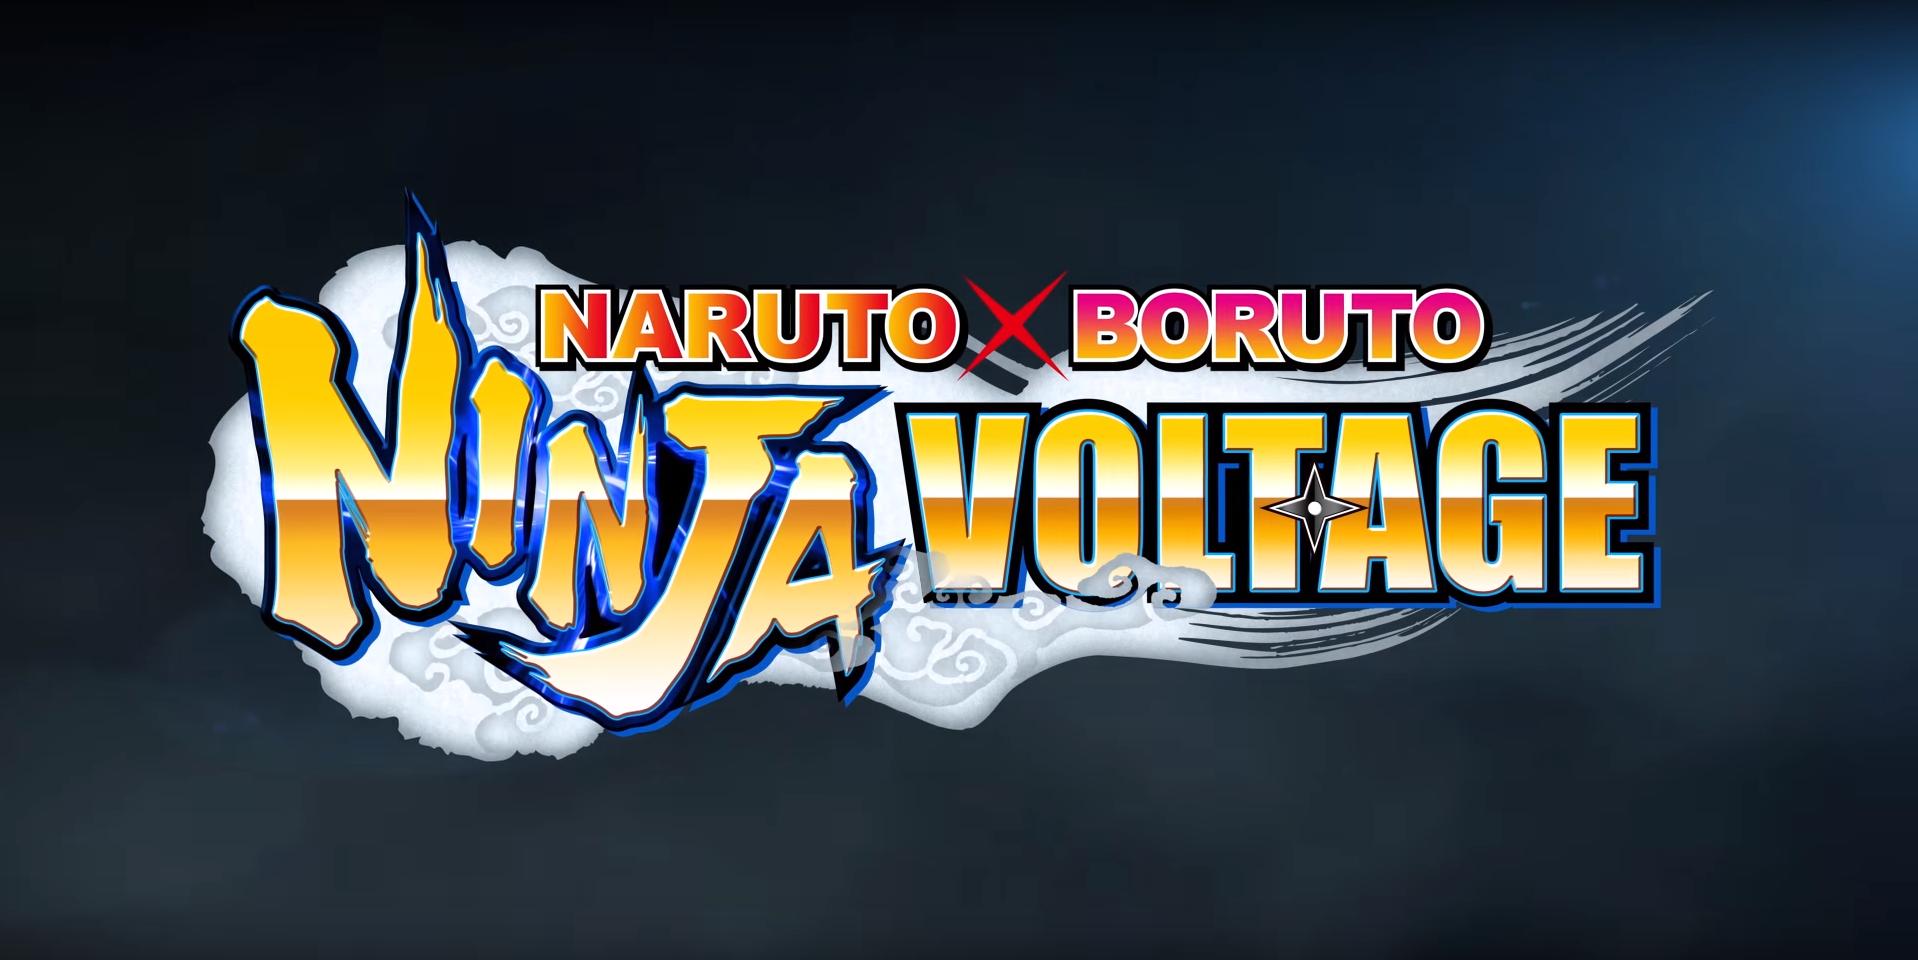 download naruto x boruto mod apk offline